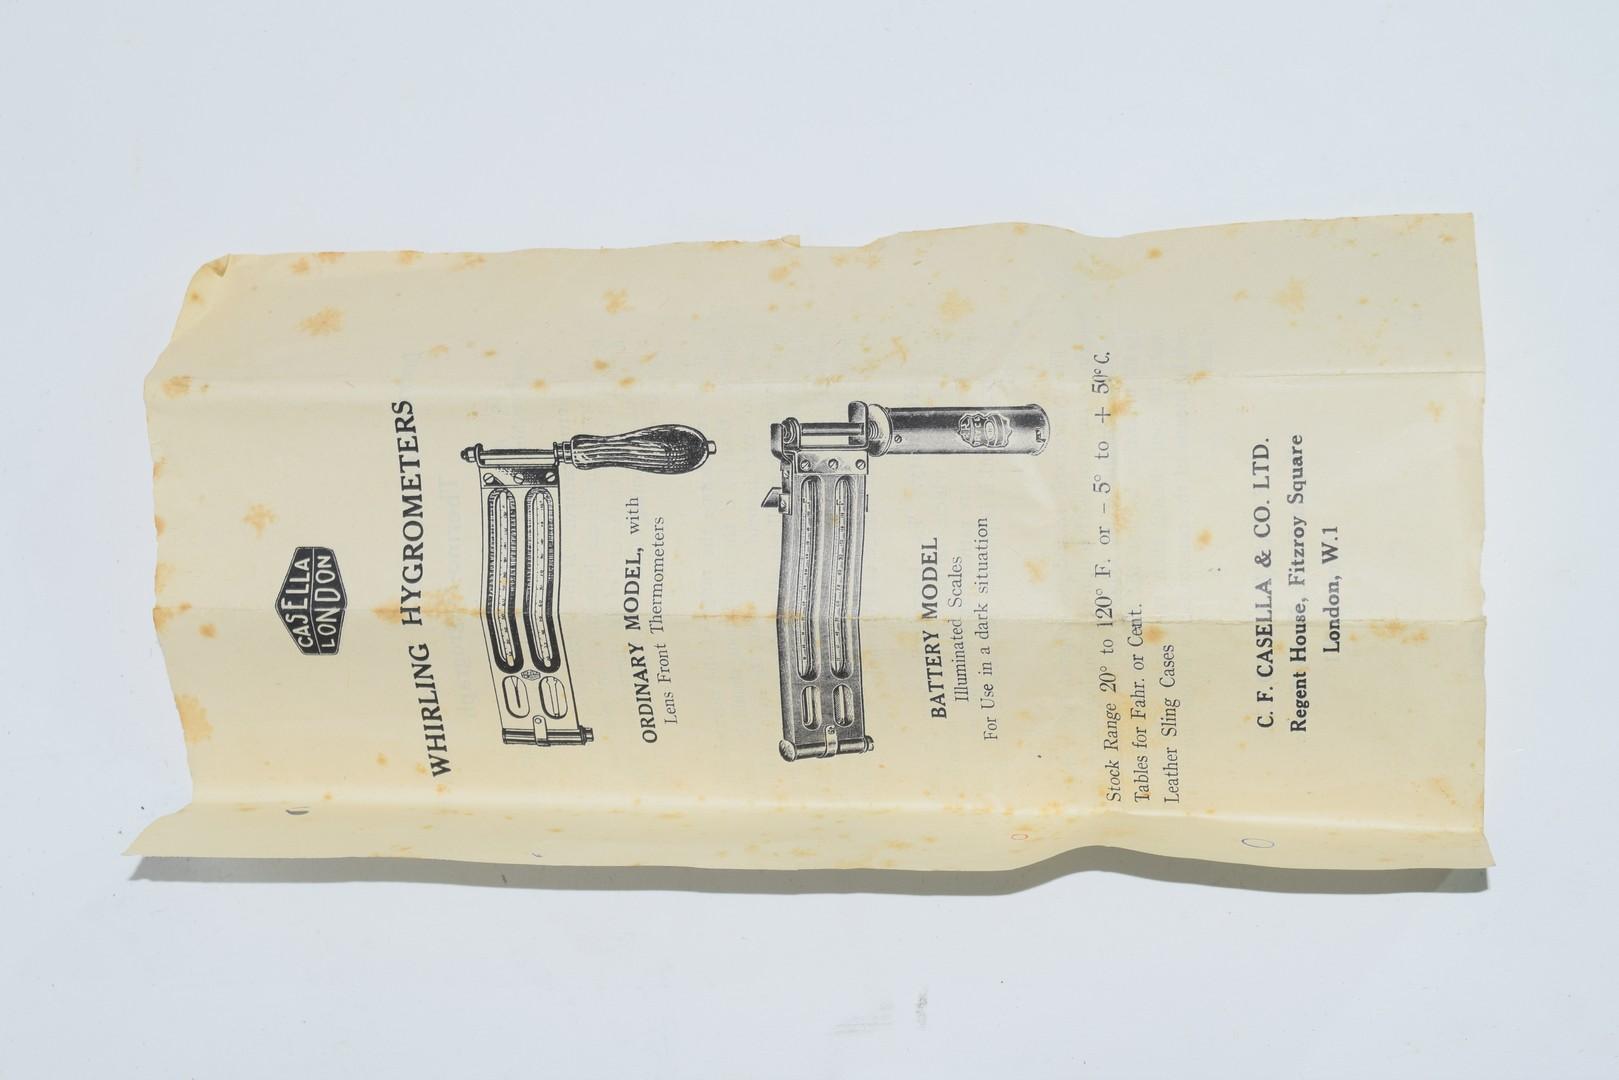 Edney Swing Hygrometer by H Steward Ltd, London - Image 2 of 4